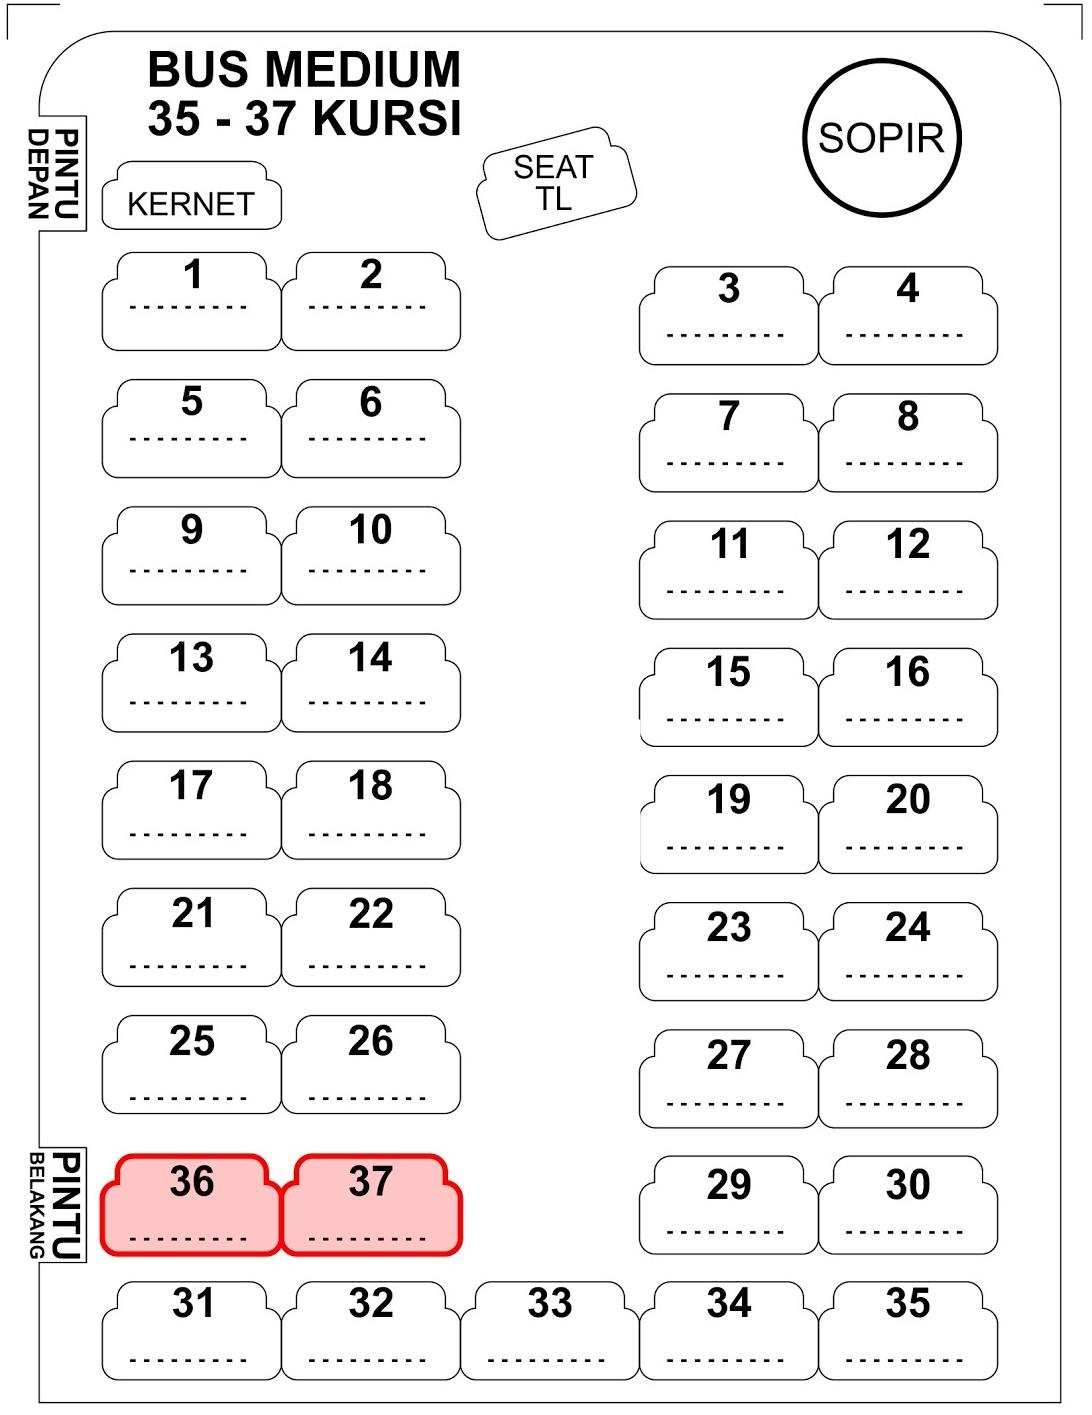 Bus pariwisata medium 35 - 37 kursi